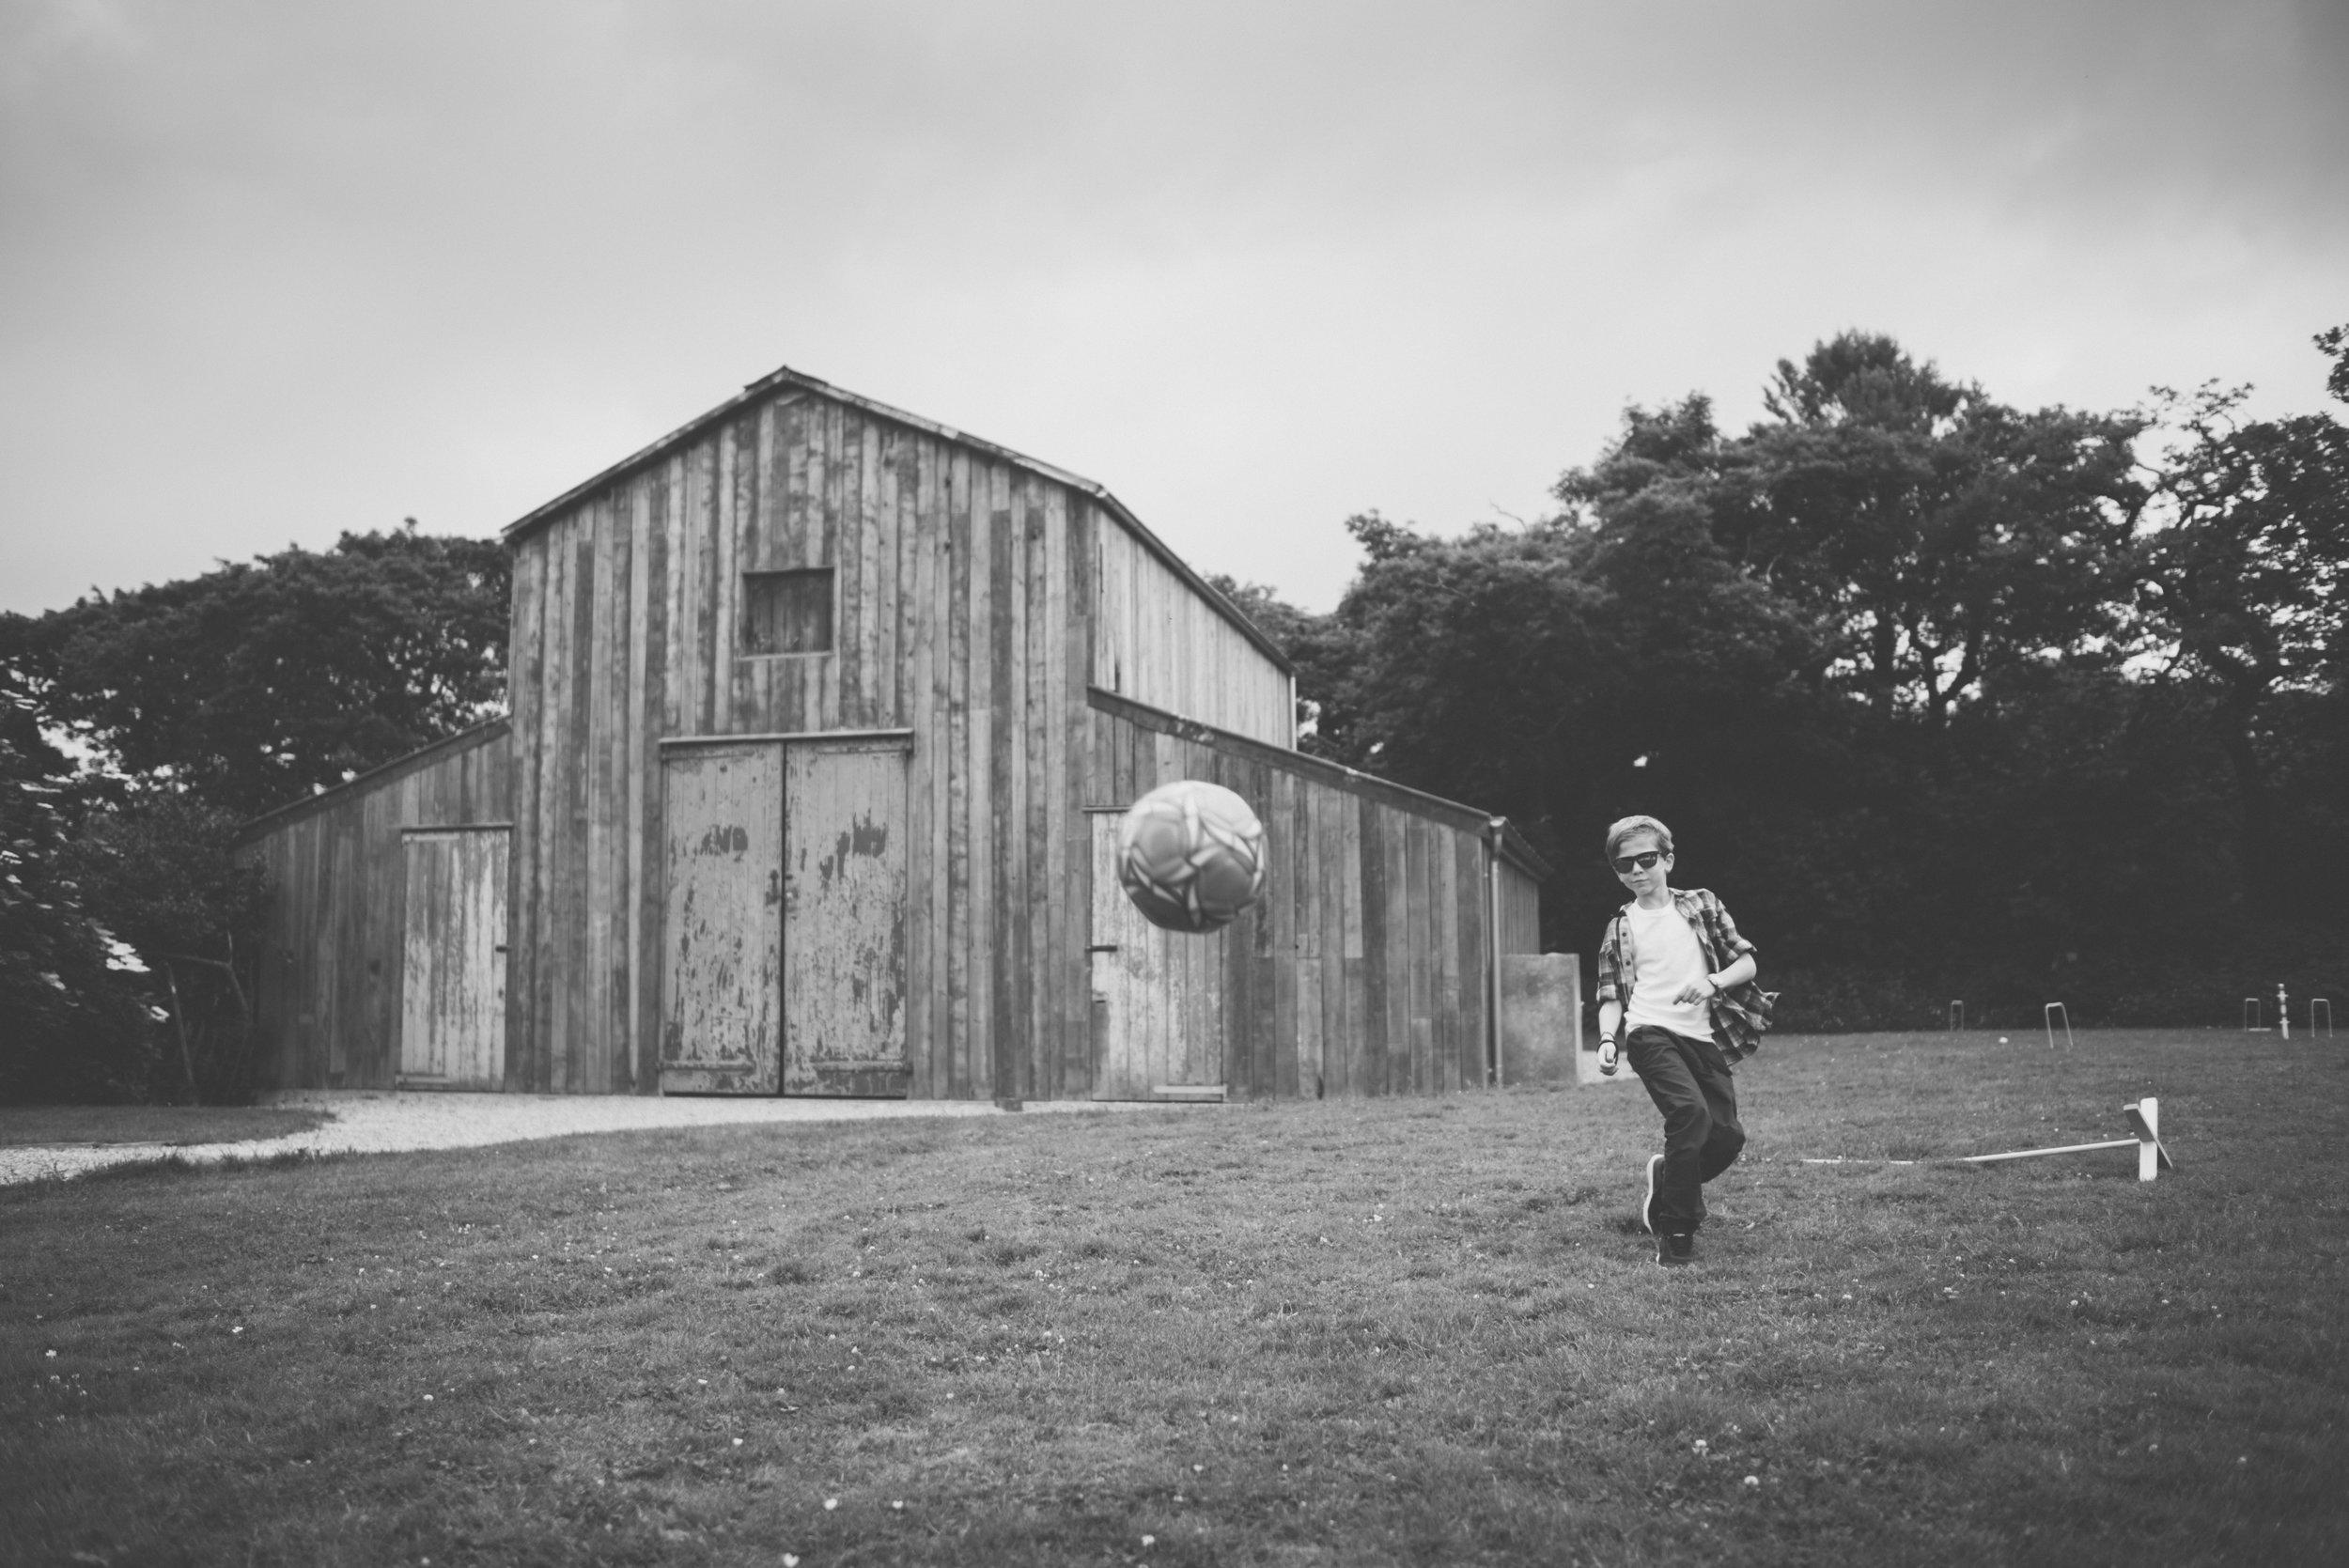 wedding-photographer-nancarrow-44.jpg